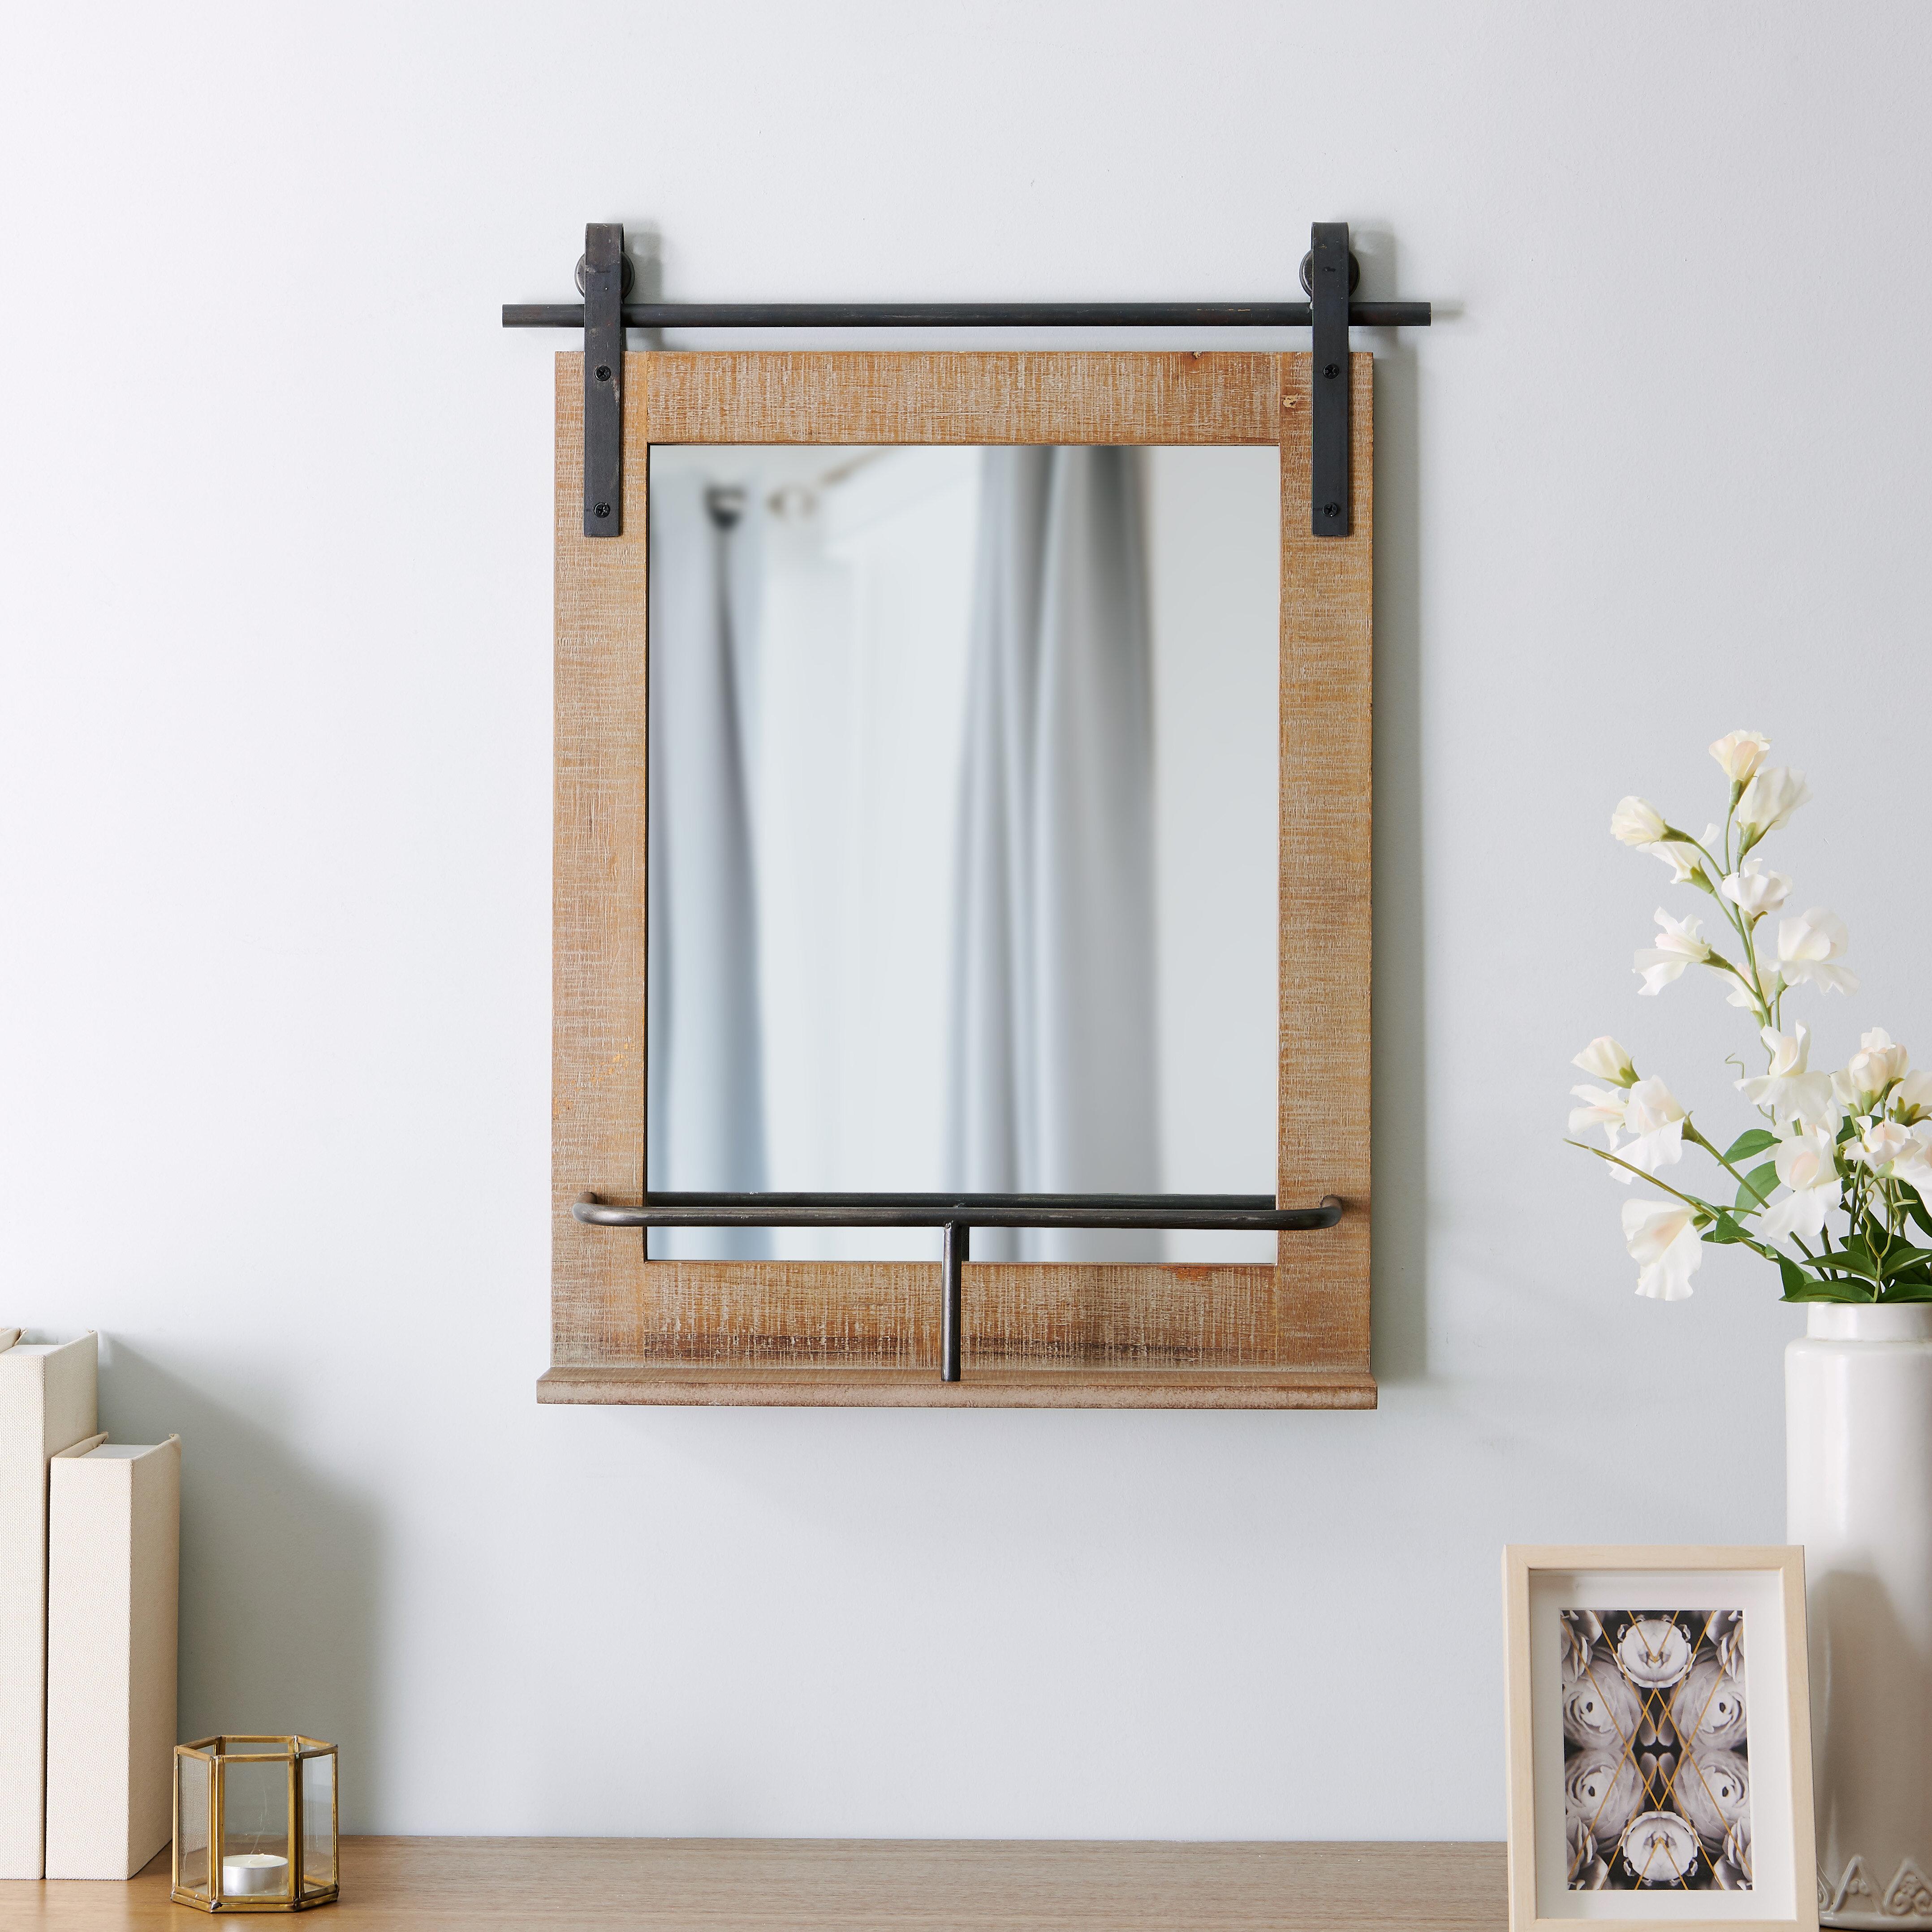 Nielsen Barn Door Rustic Shelves Accent Mirror With Rena Accent Mirrors (Image 15 of 20)